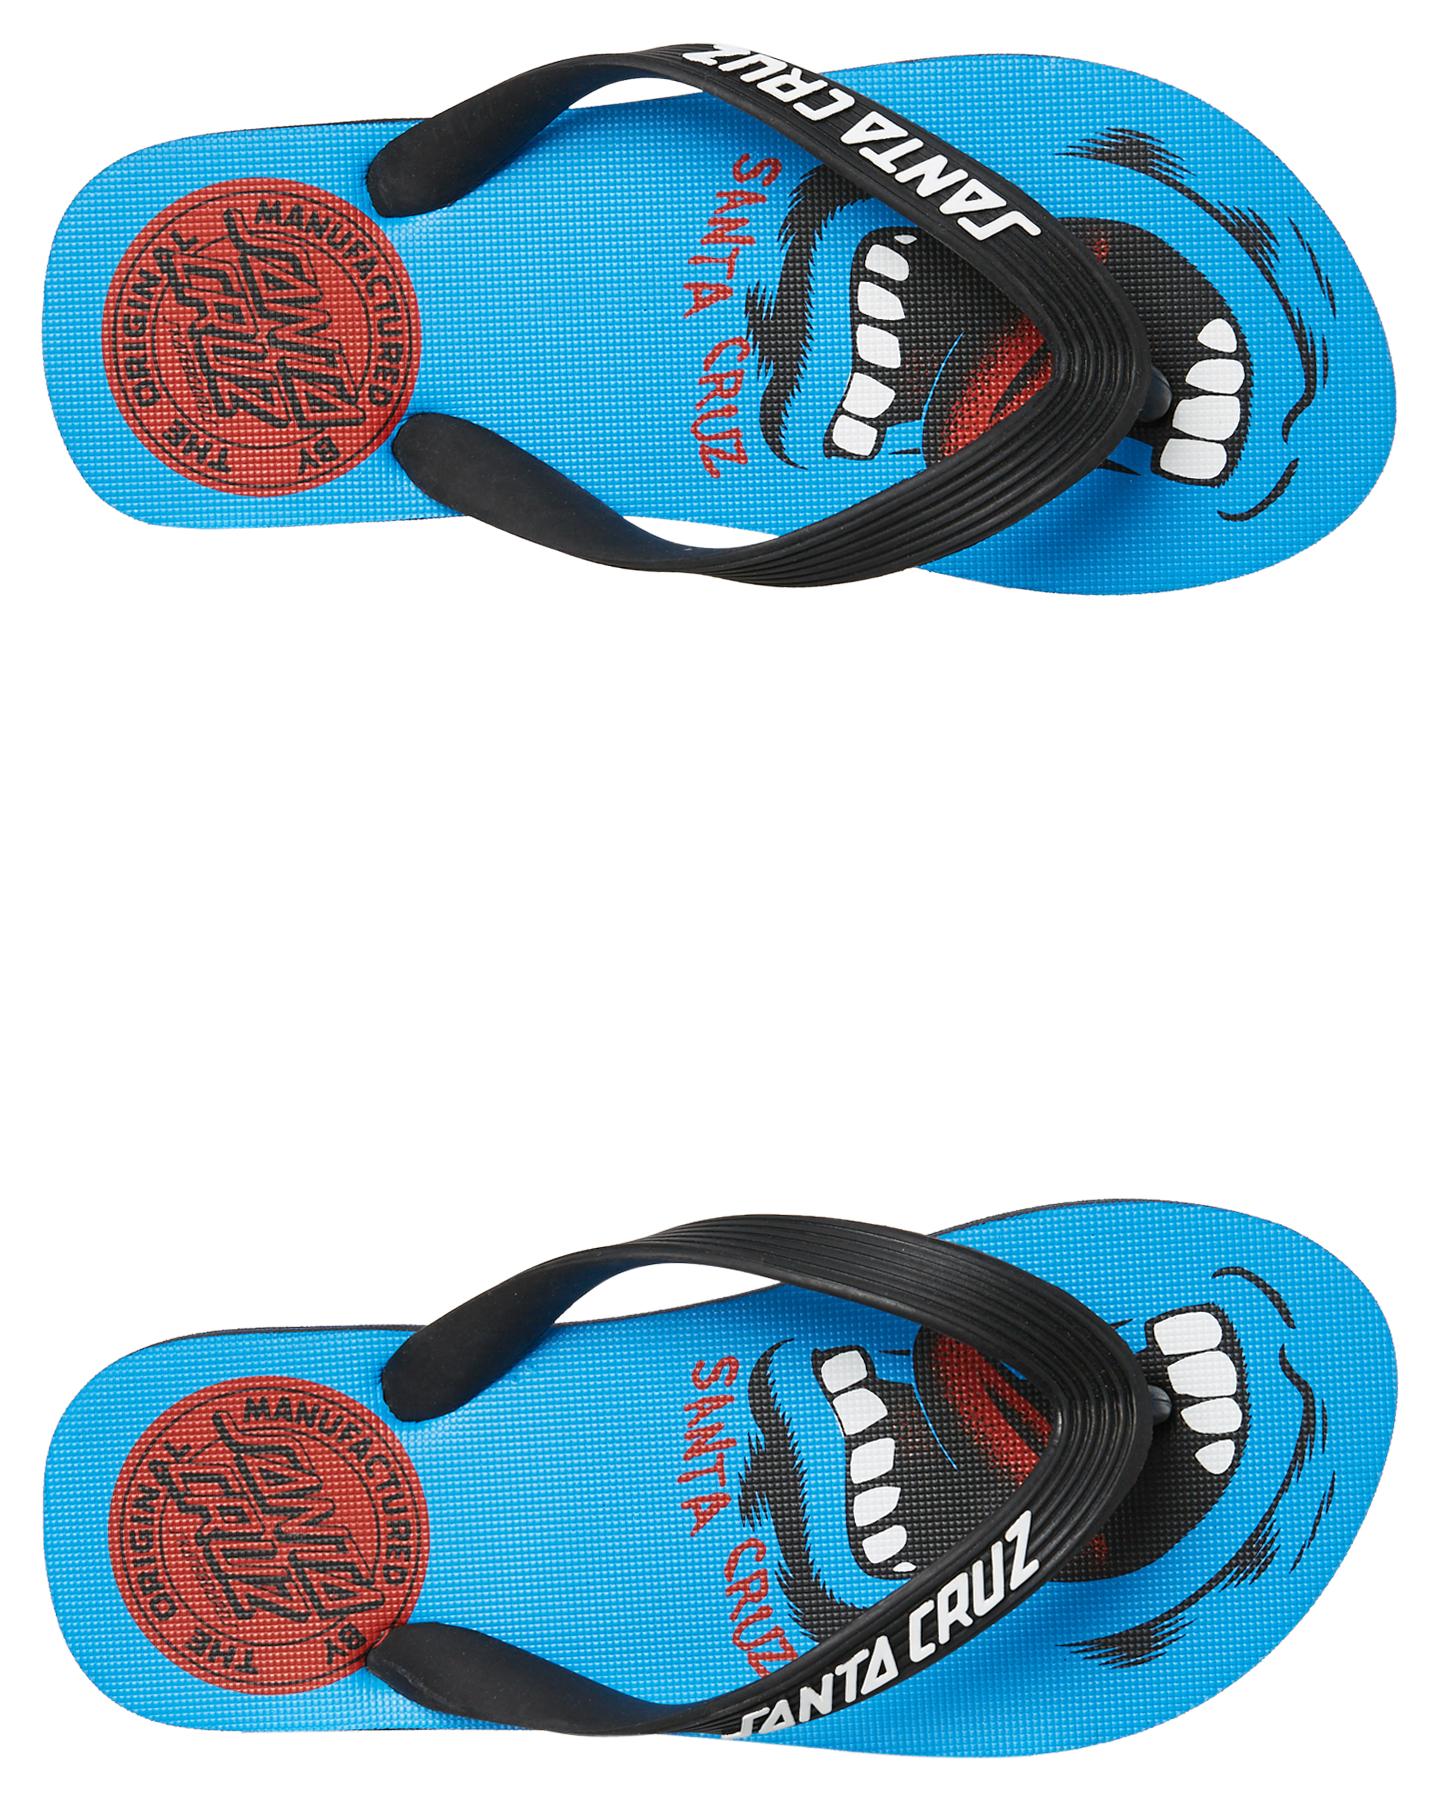 Santa Cruz Screamer Thongs - Youth Blue